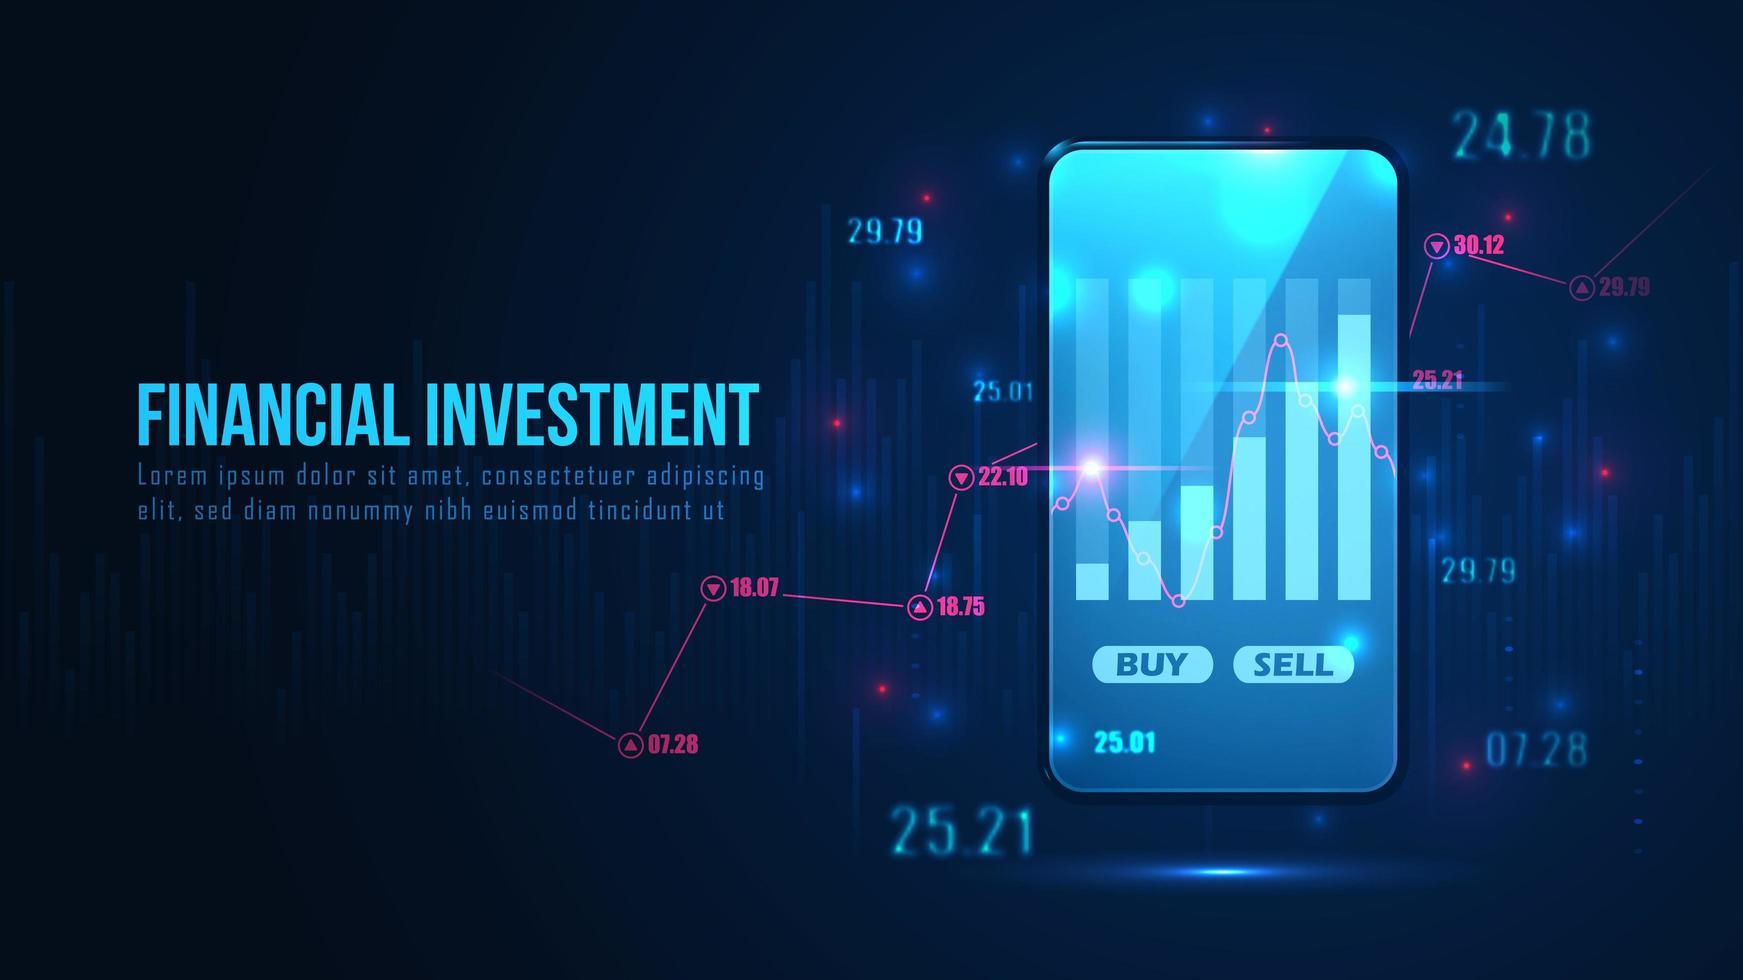 finansiell investeringsdesign med handelsdiagram på telefon vektor